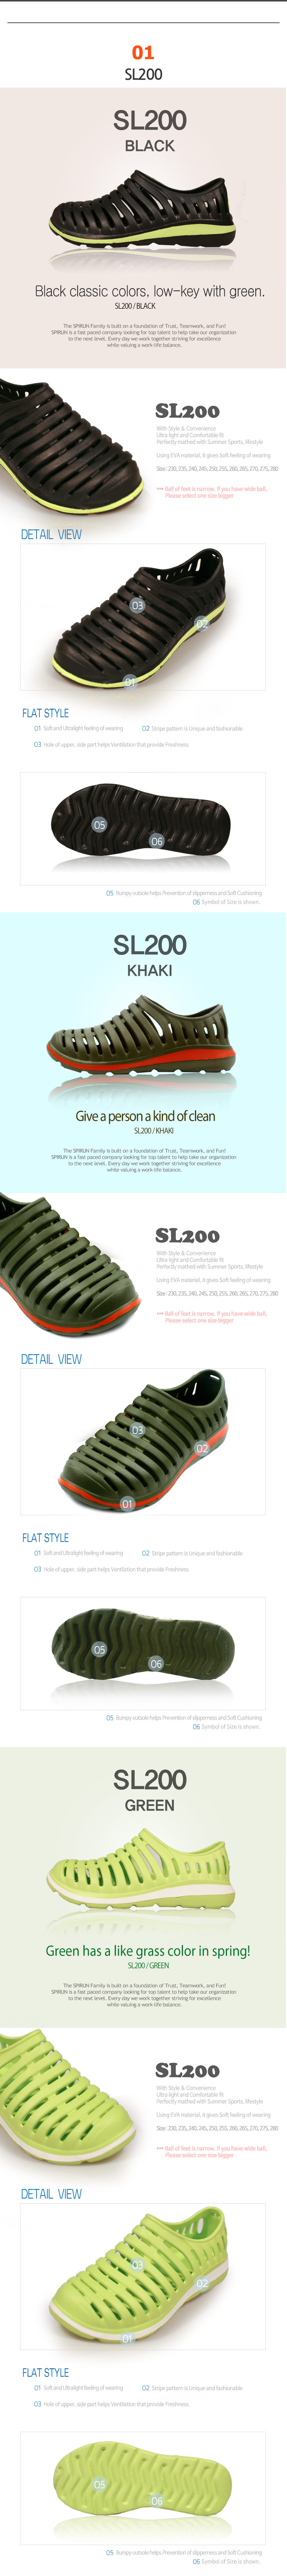 Buy [SANDALS]?SLAZENGER AQUA SHOES? BRAND AQUA SANDALS/Cooling waterproof  Sport Skins/AQUA SHOES/couple shoes/Women men shoes Deals for only S$7 9